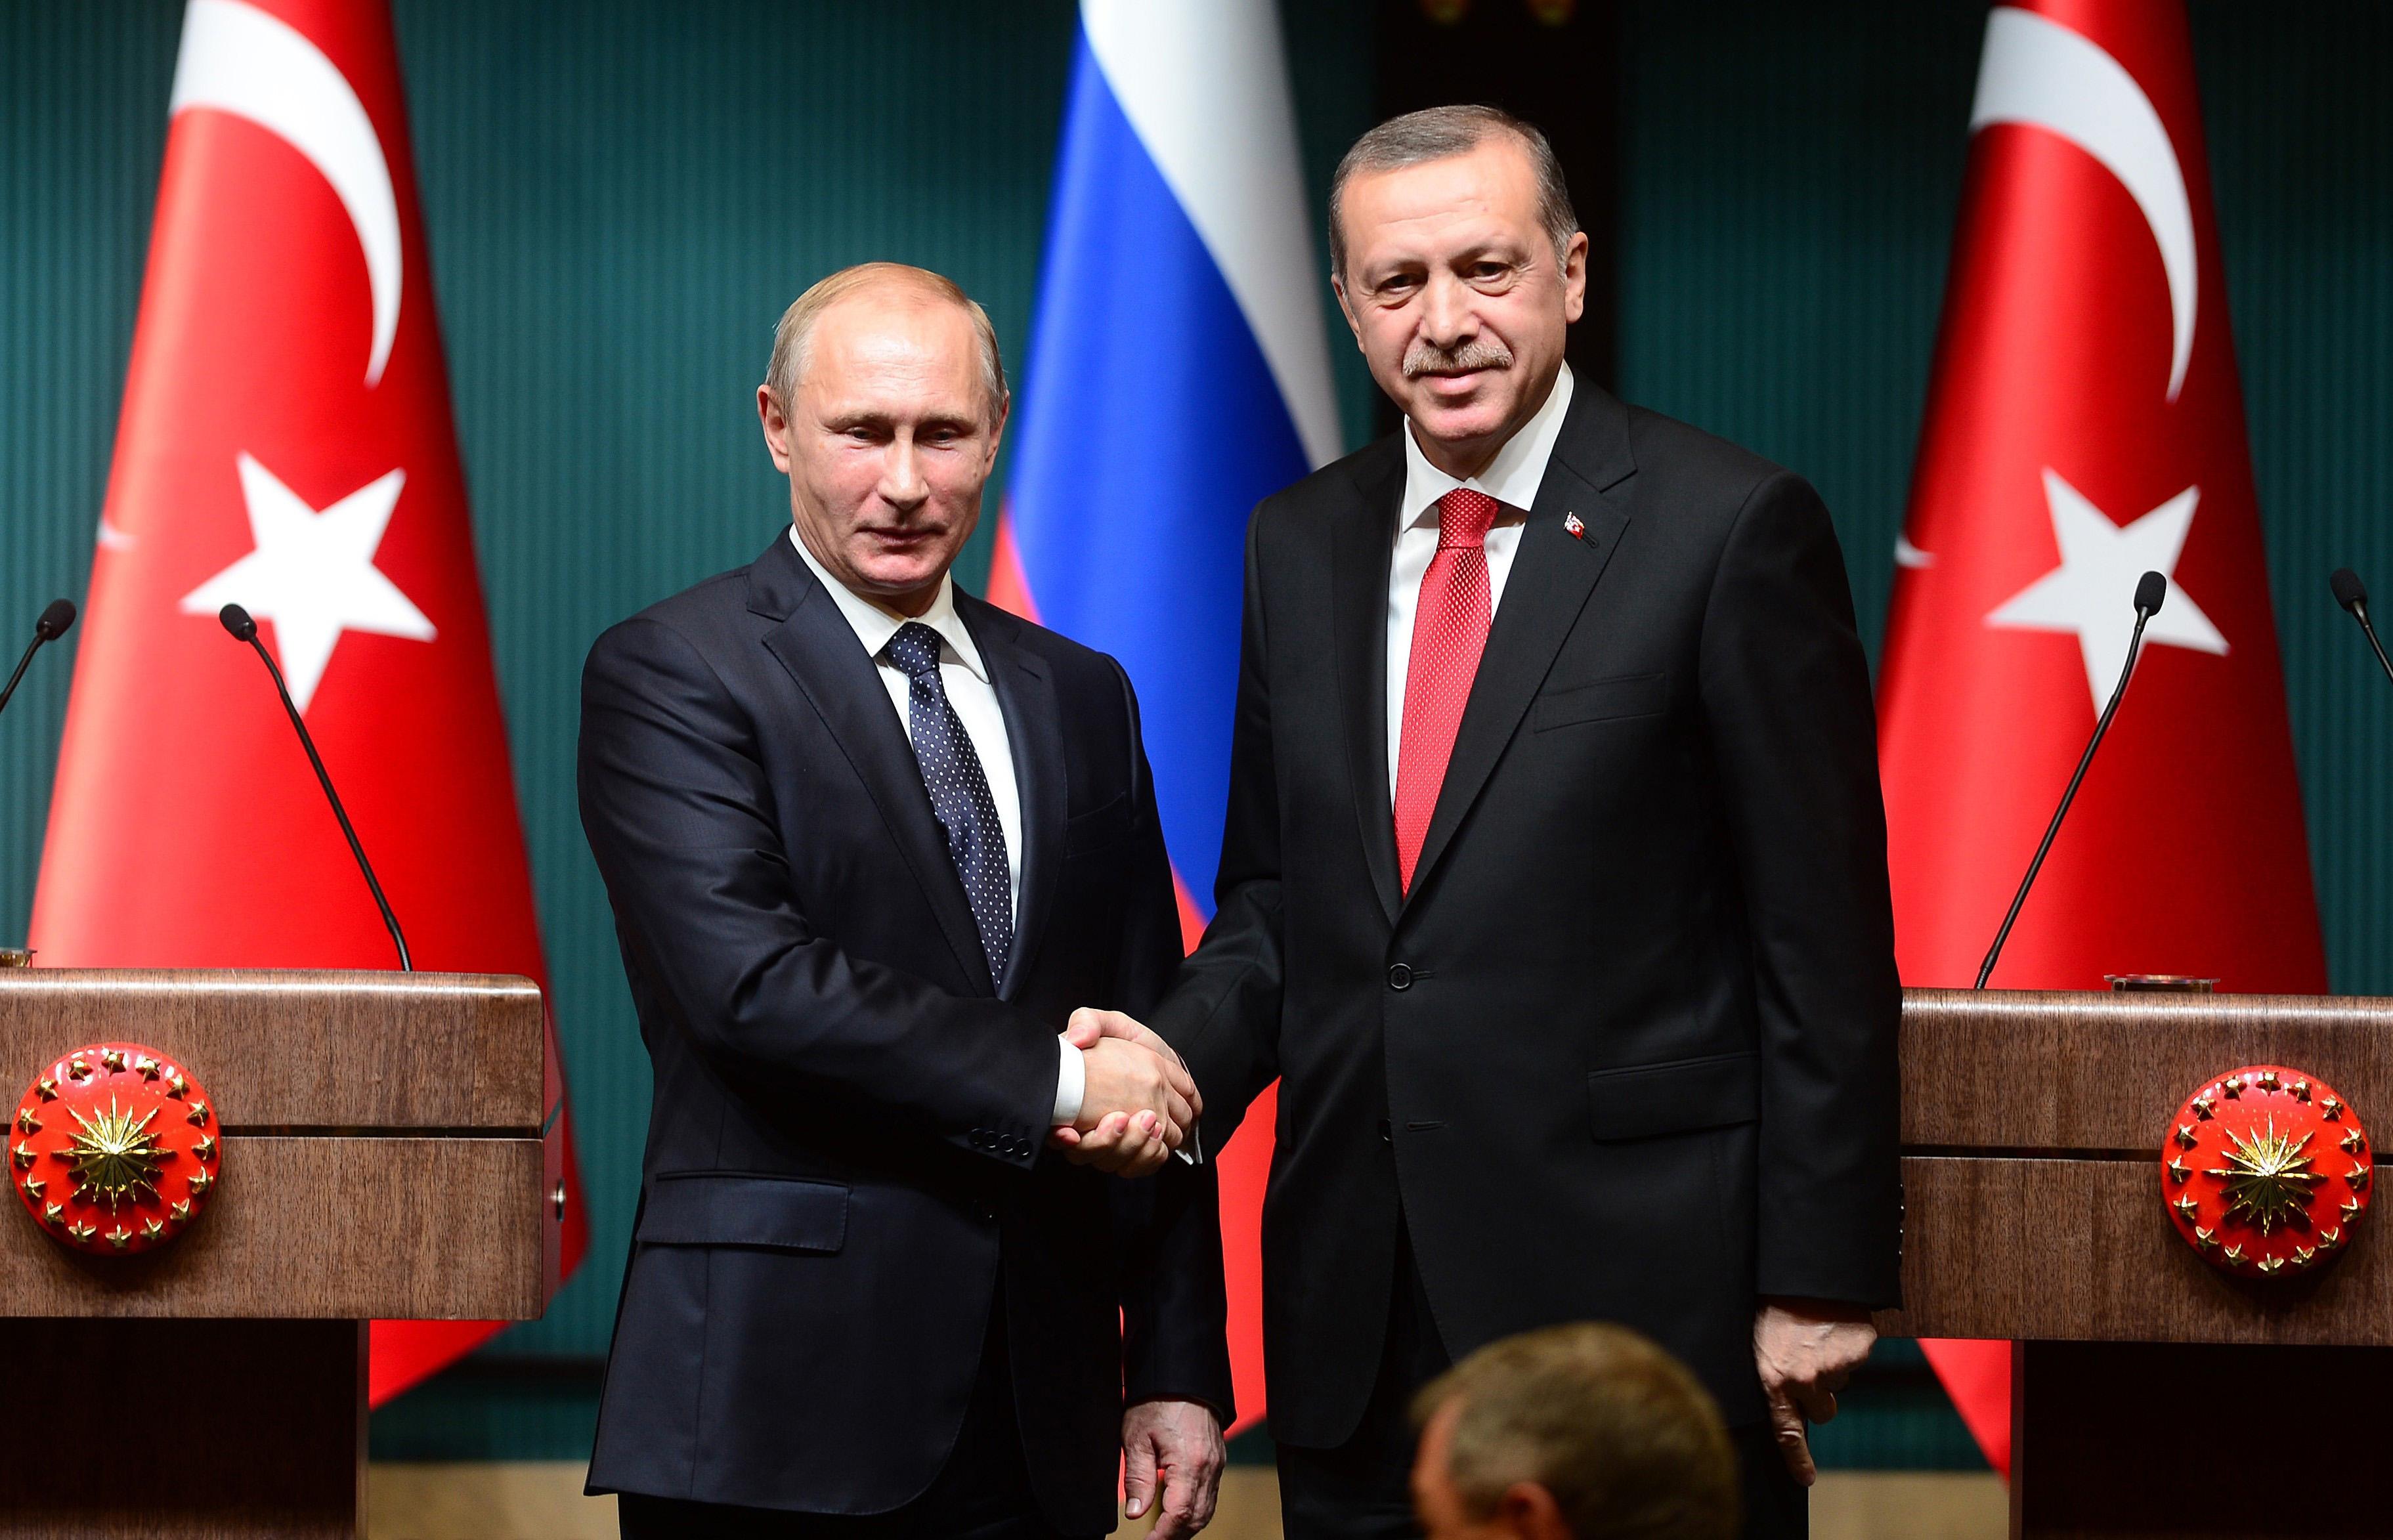 Press conference of Erdogan and Putin in Ankara